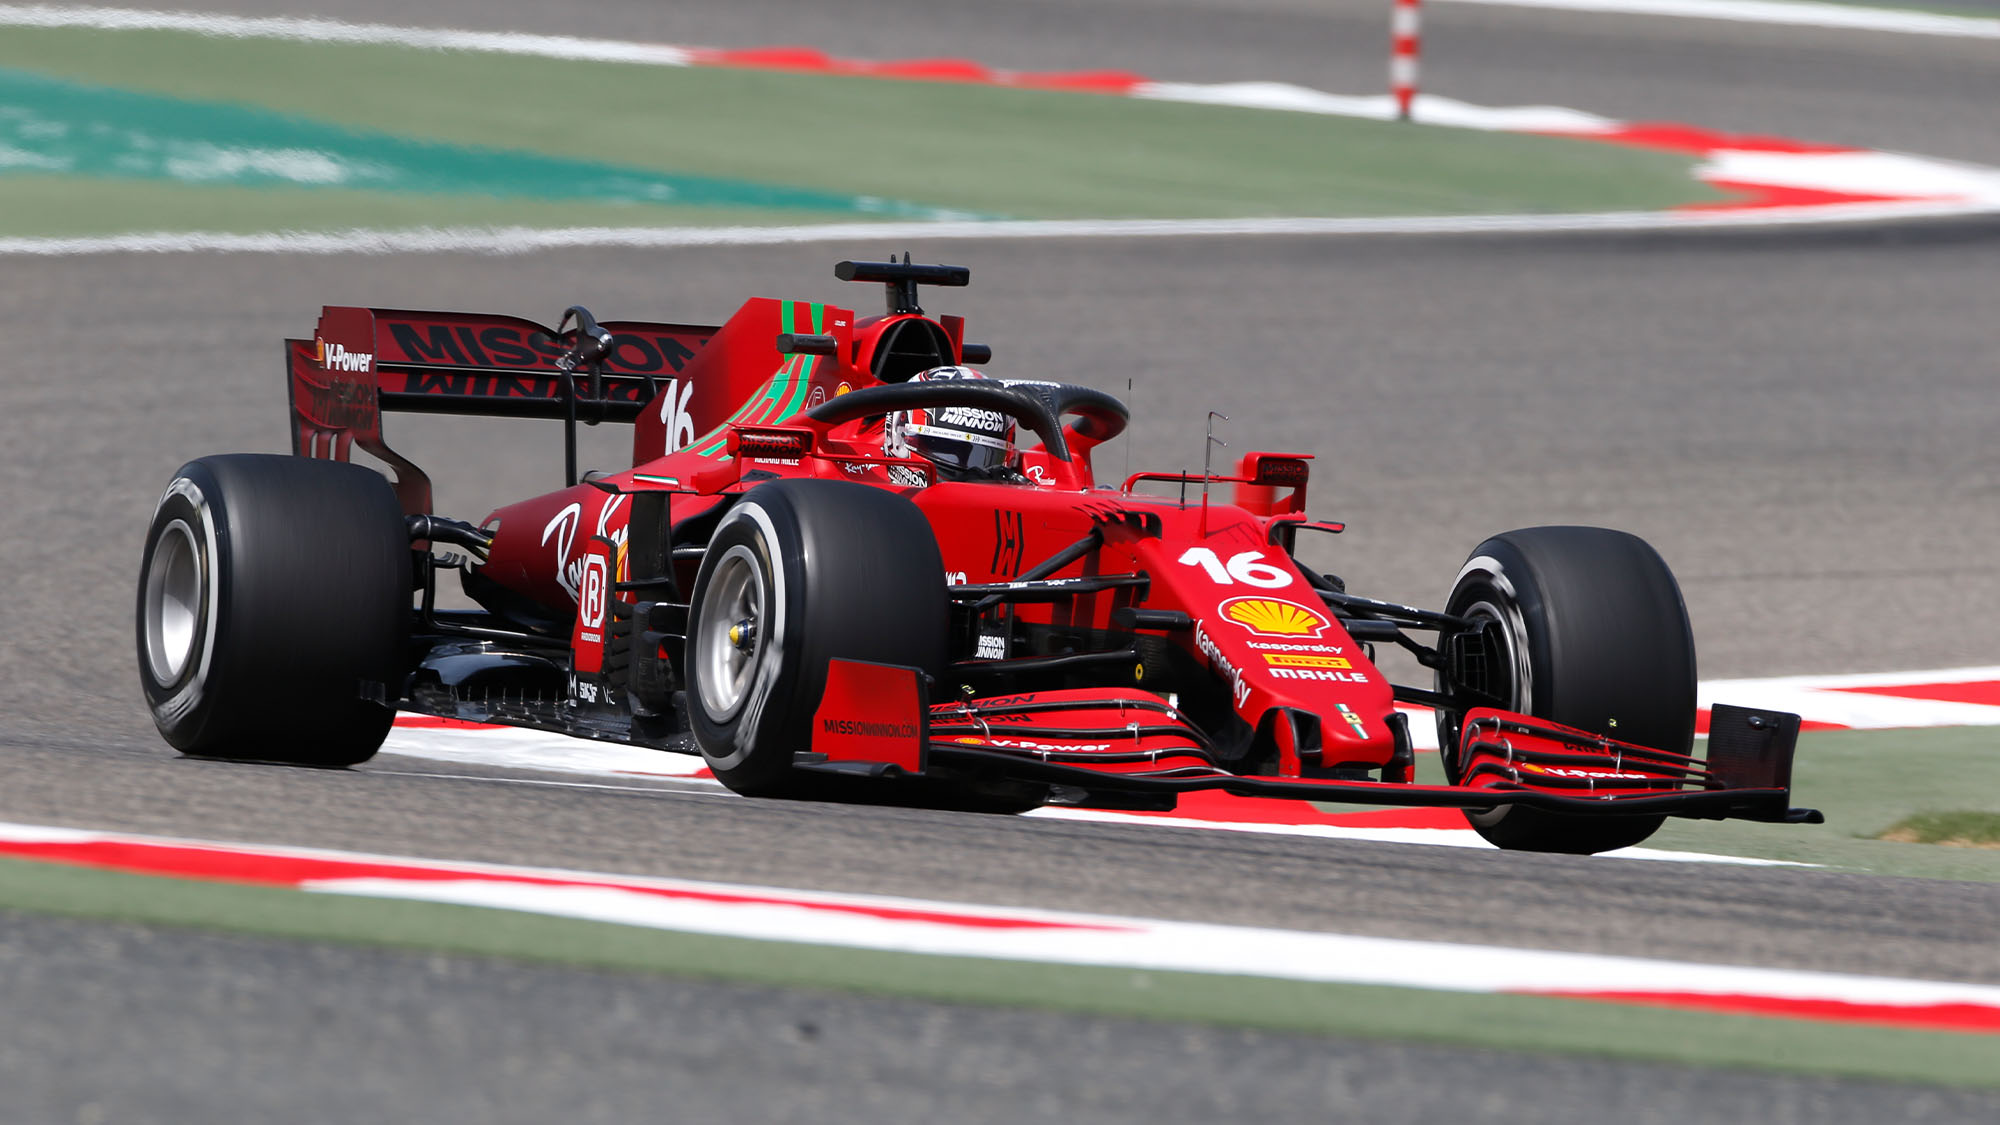 Charles Leclerc during F1 2021 preseason testing